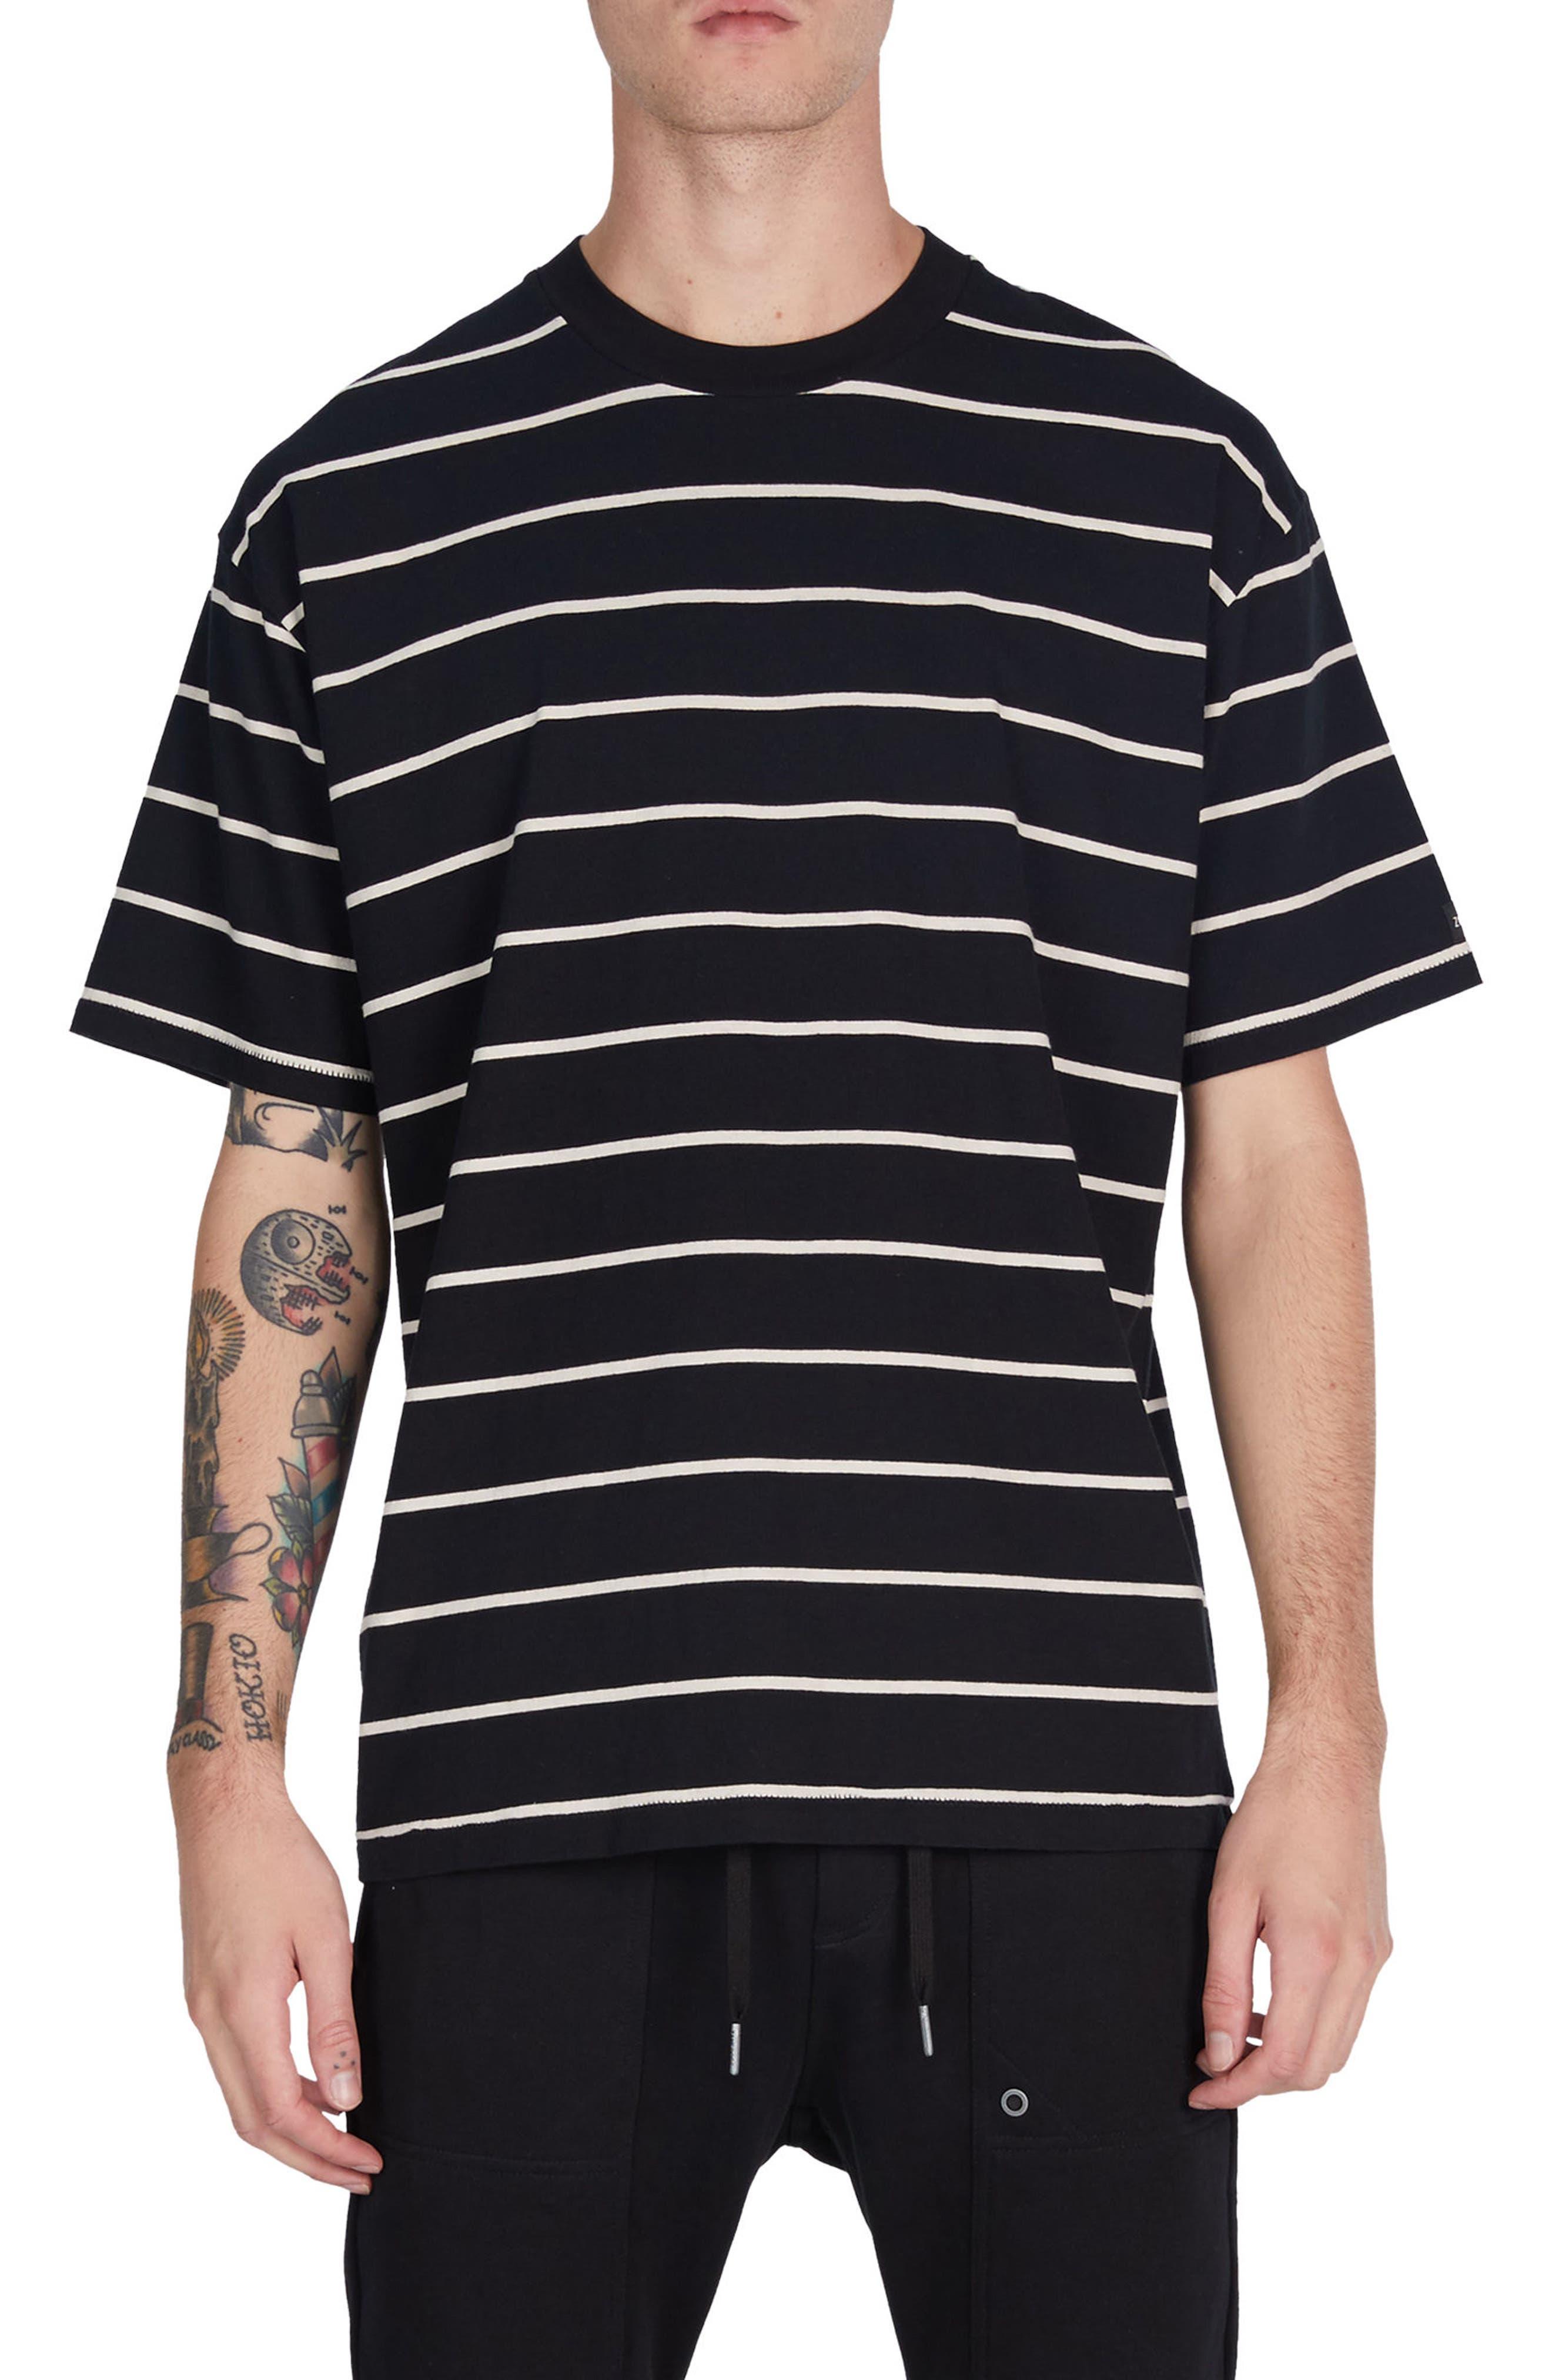 Alternate Image 1 Selected - ZANEROBE Box Stripes T-Shirt